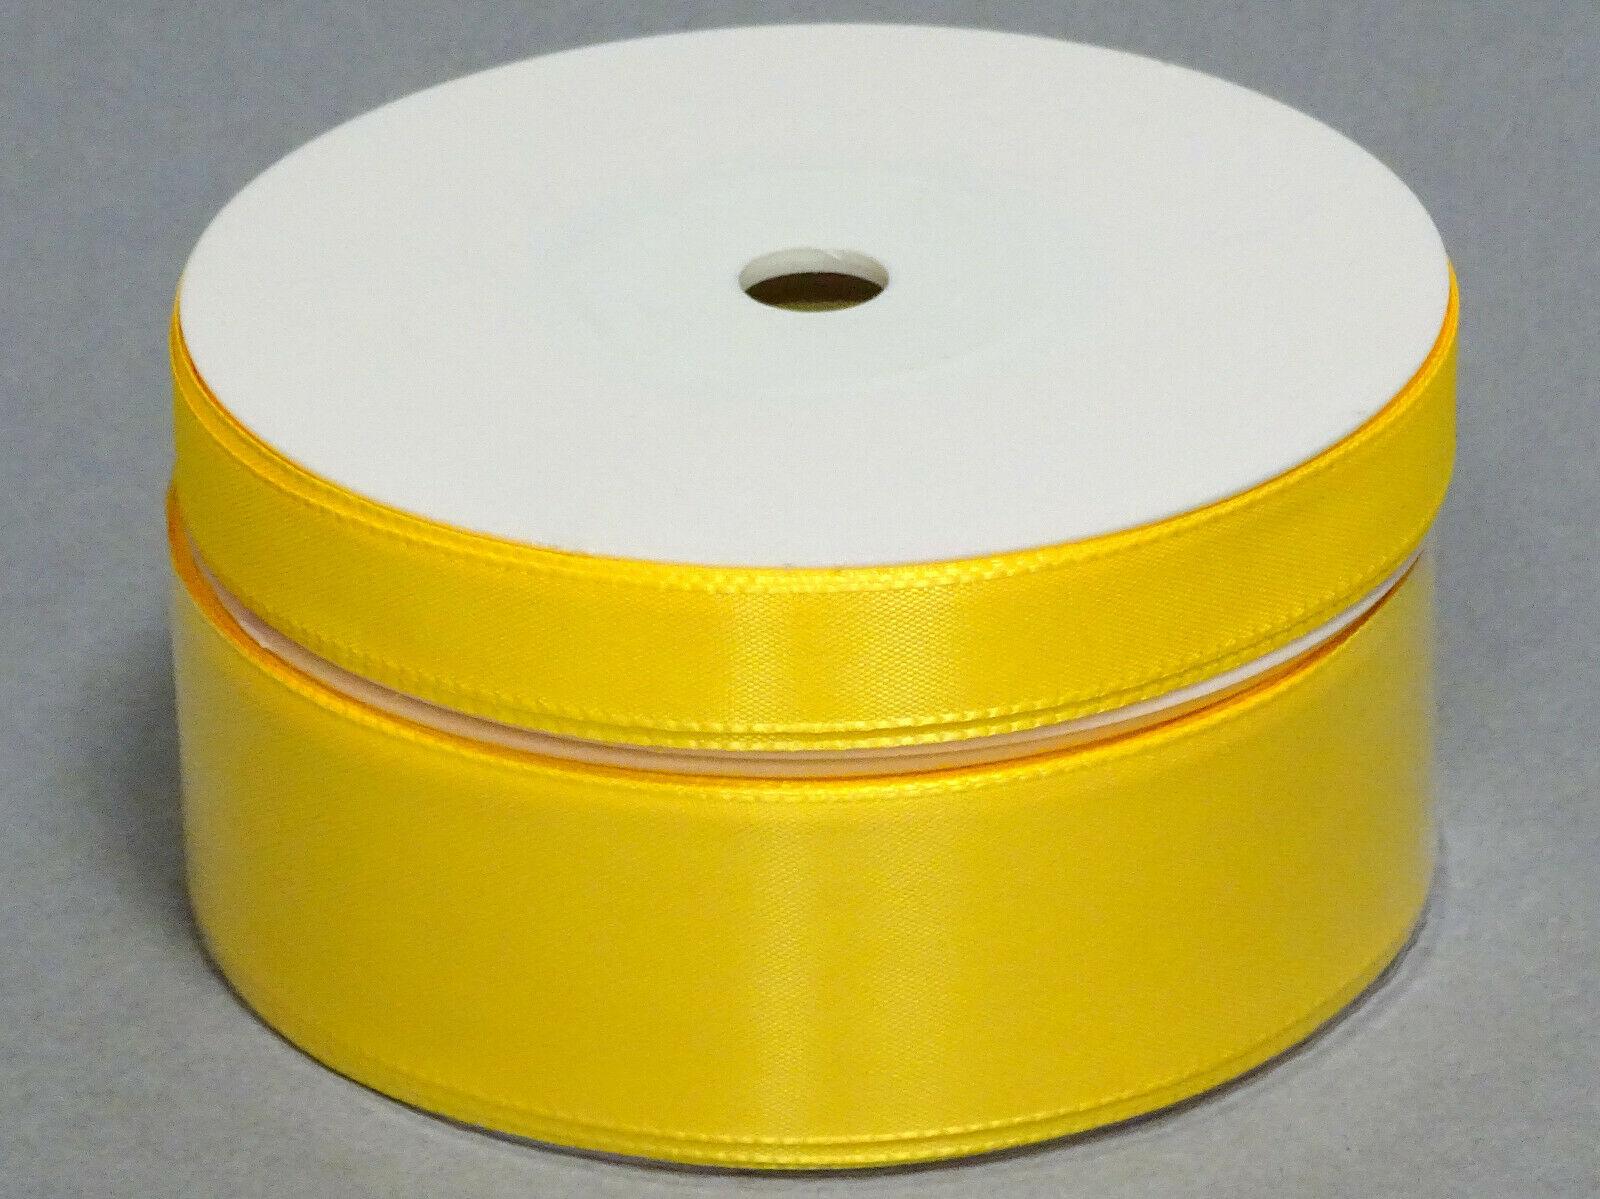 Seidenband Schleifenband 50 m x 15 / 25 / 40mm Dekoband ab 0,08€/m Geschenkband  - Gelb 245, 25 mm x 50 m